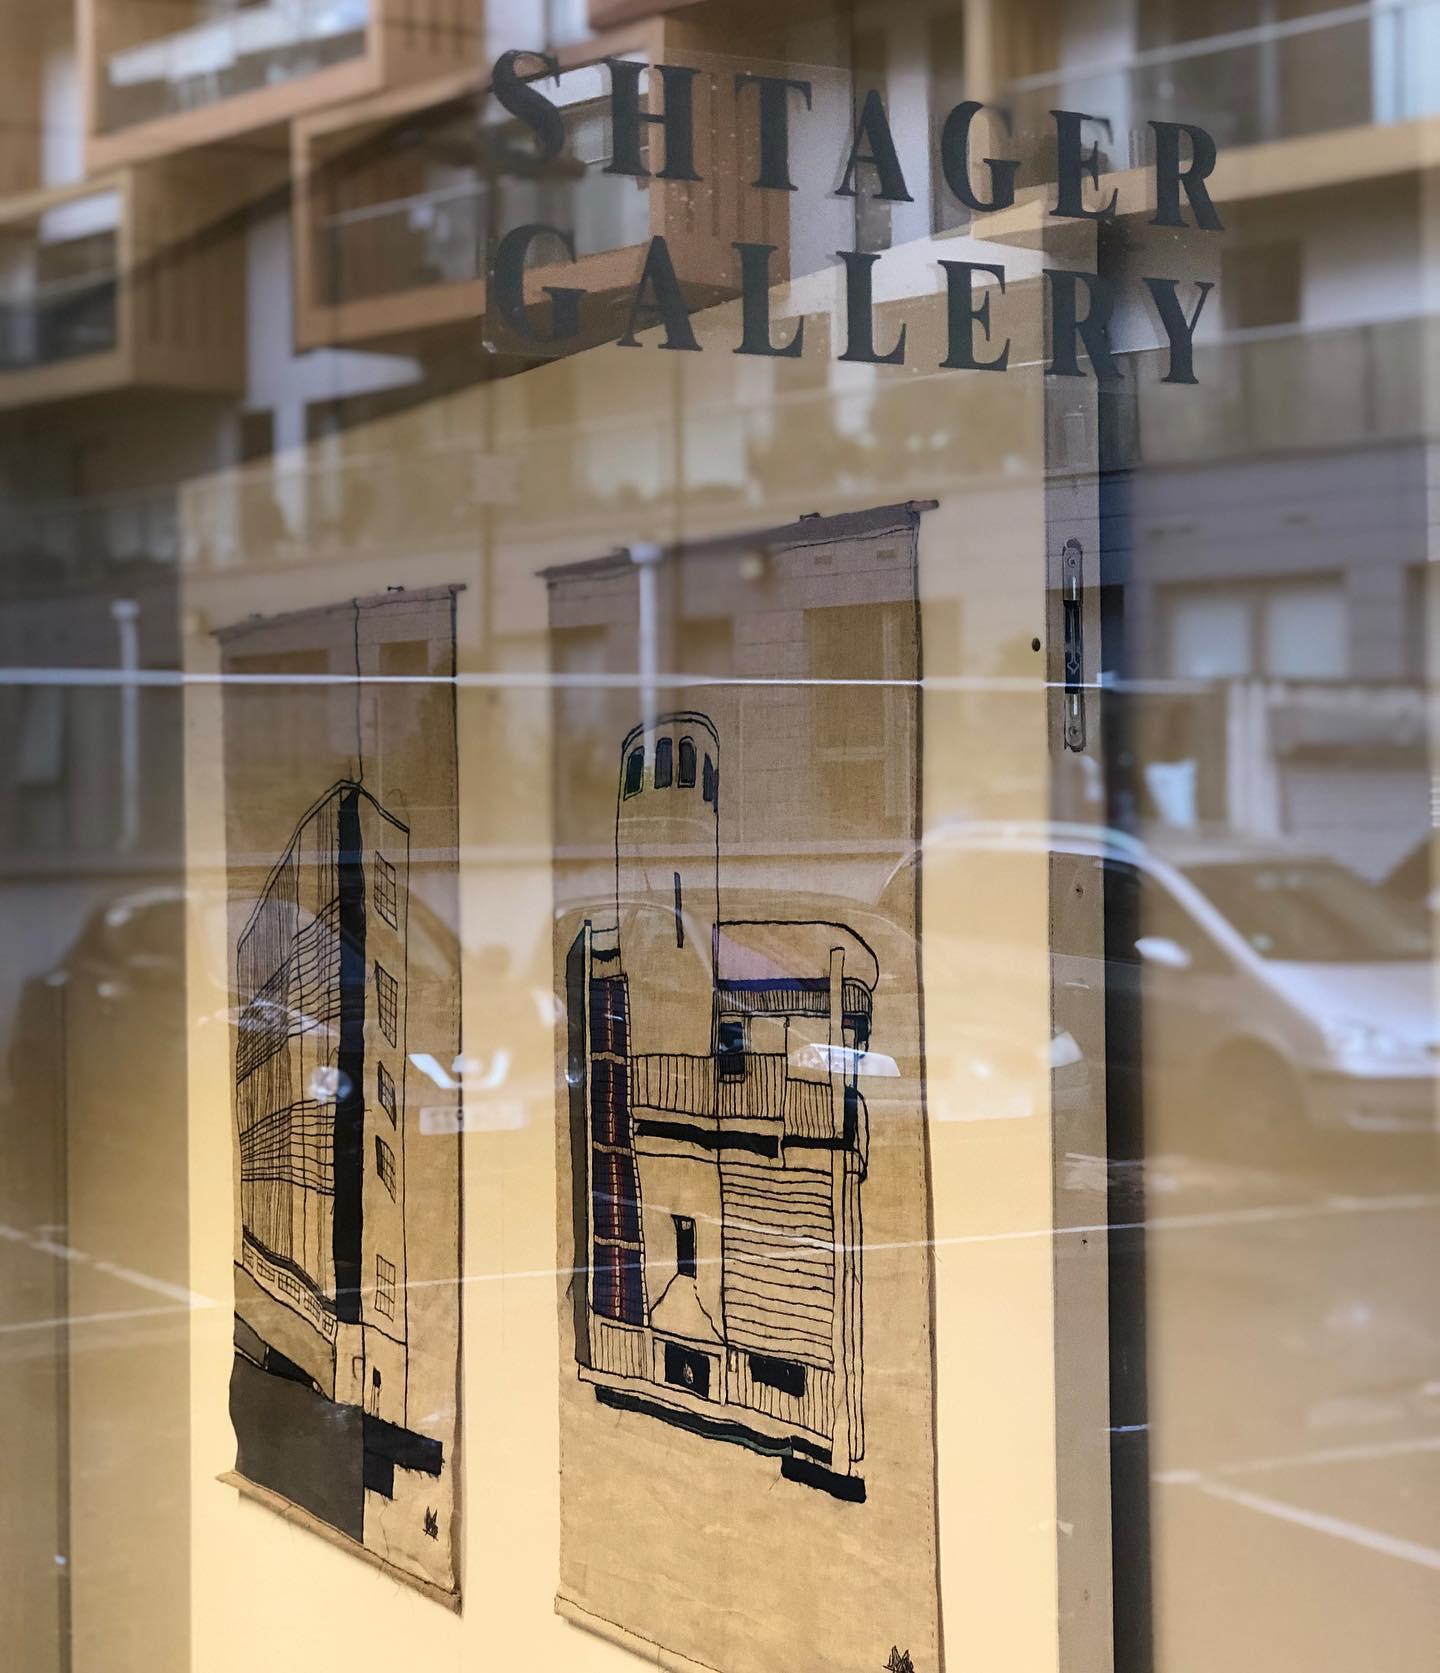 Maria Arendt's opening exhibition. Bauhaus - 100. 2019